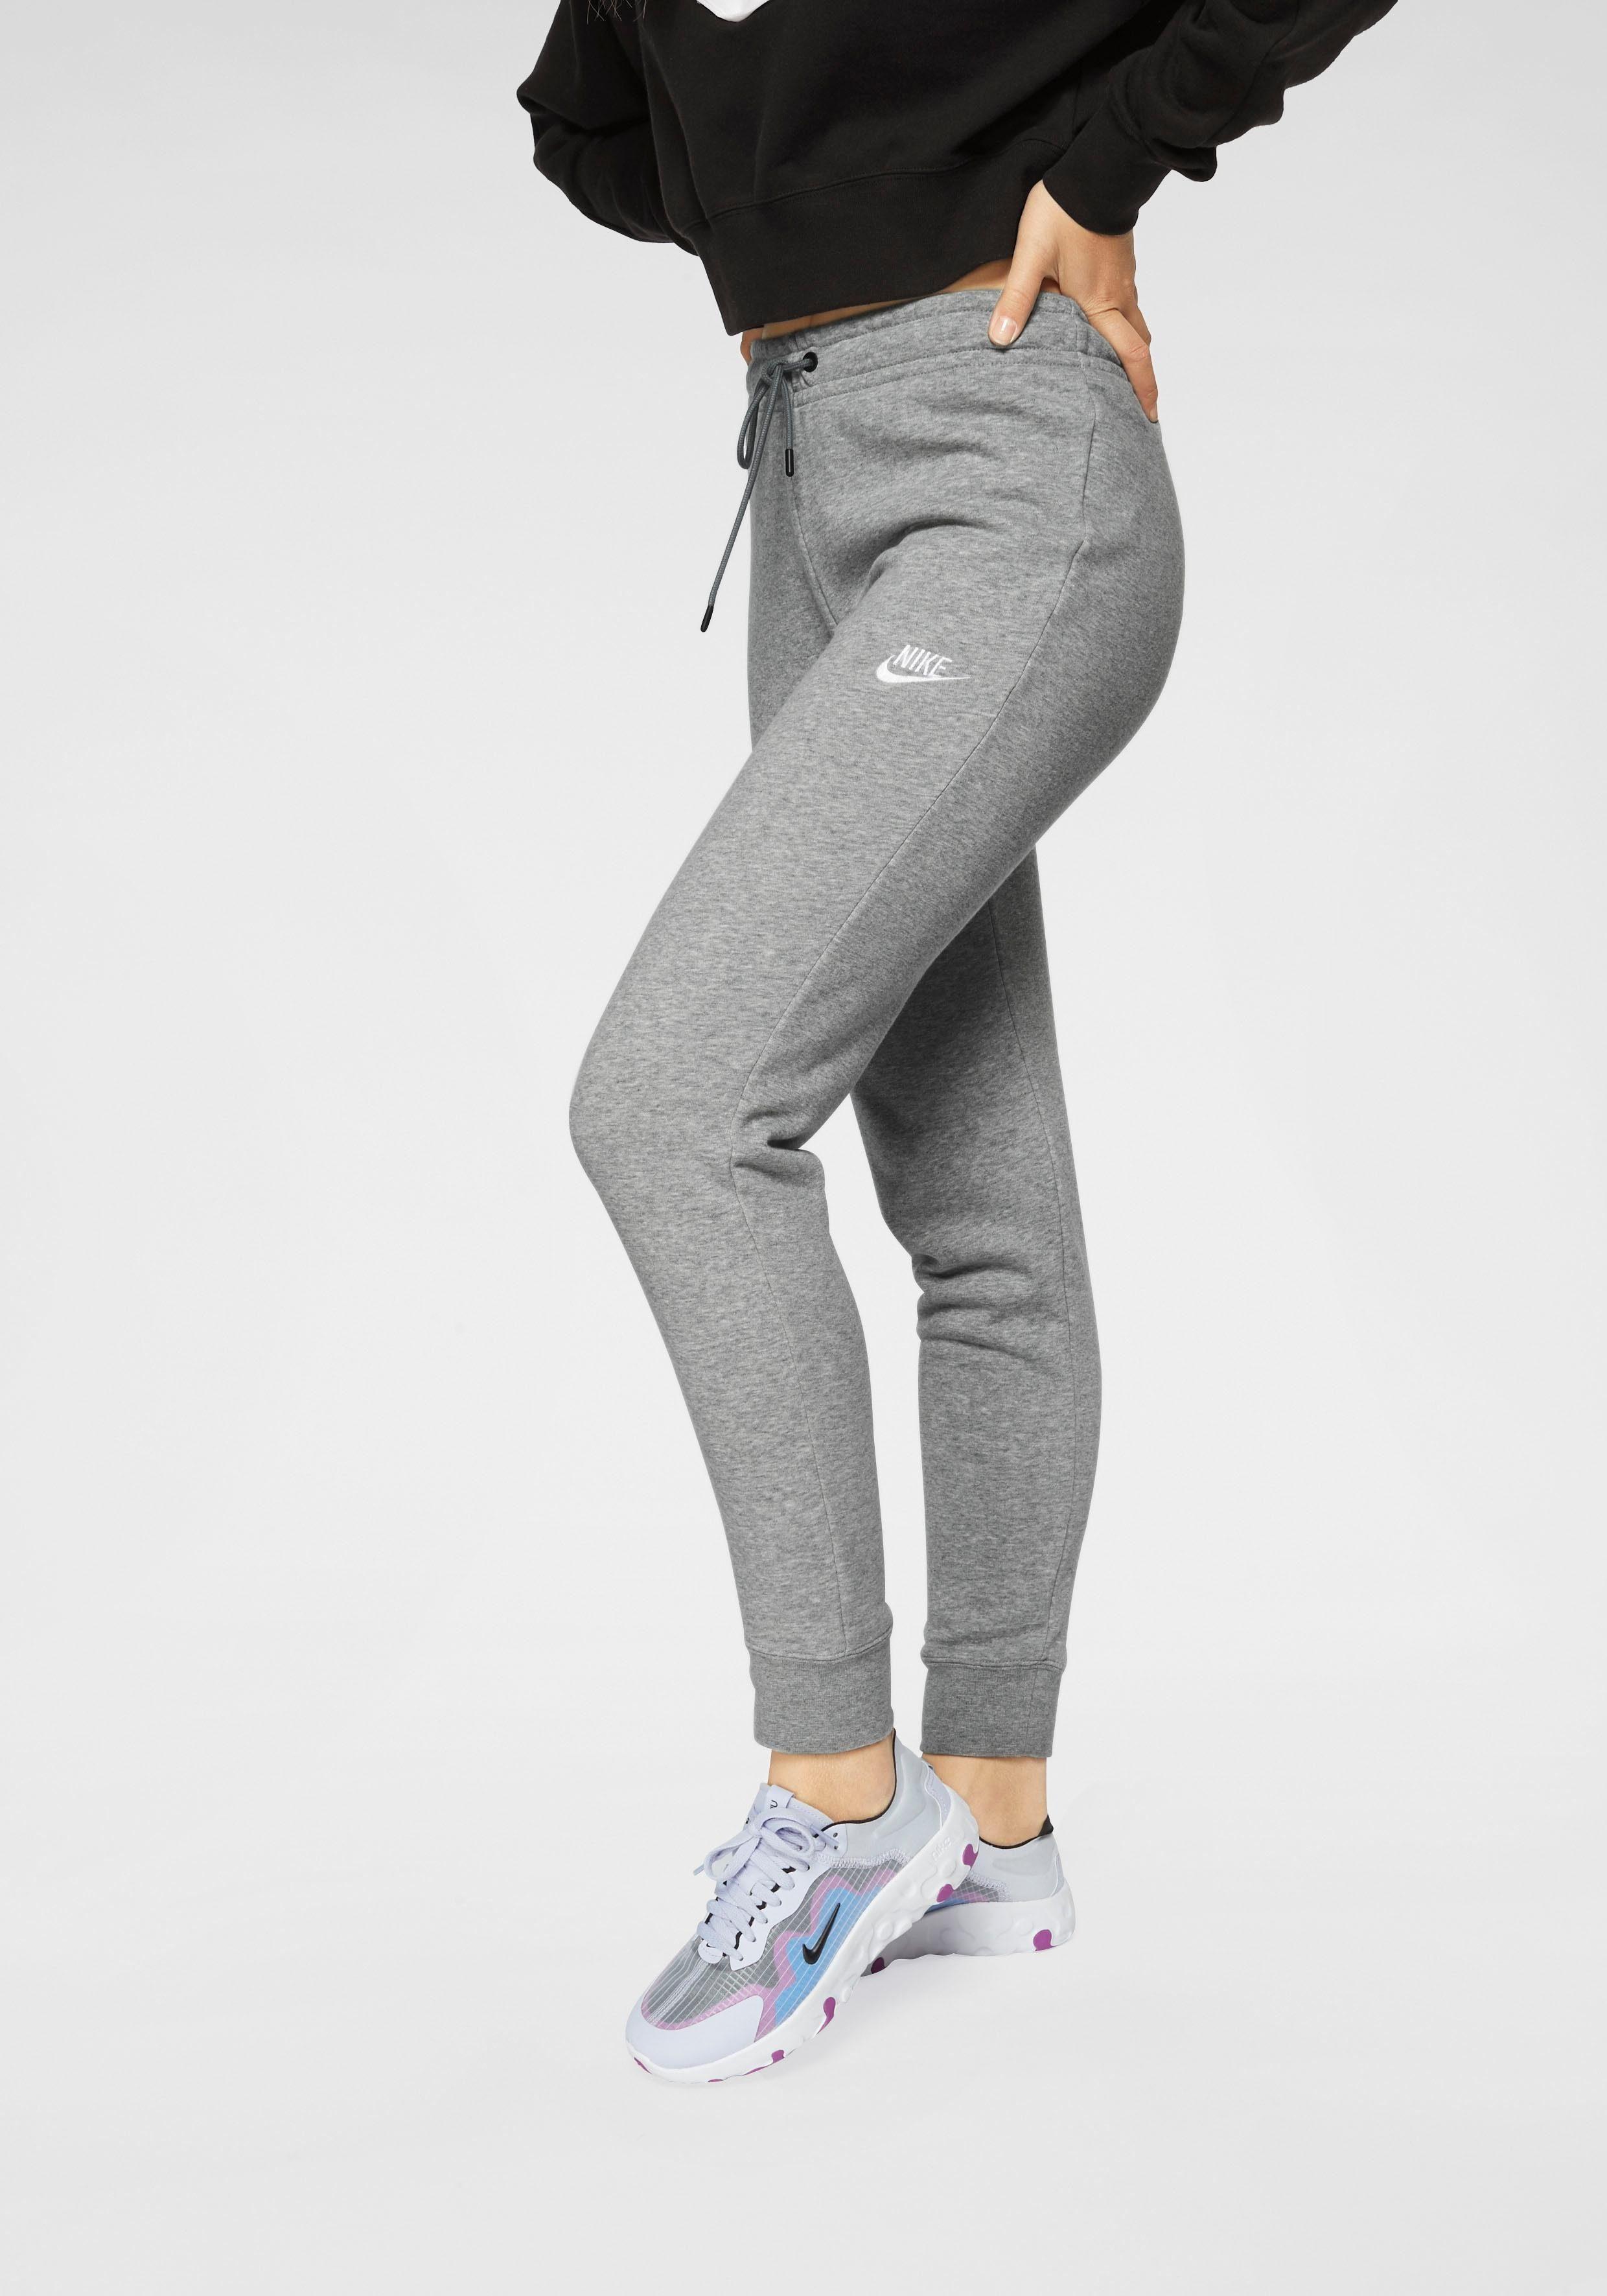 Nike Sportswear Jogger Pants »W NSW ESSNTL PANT TIGHT FLC« online kaufen | OTTO